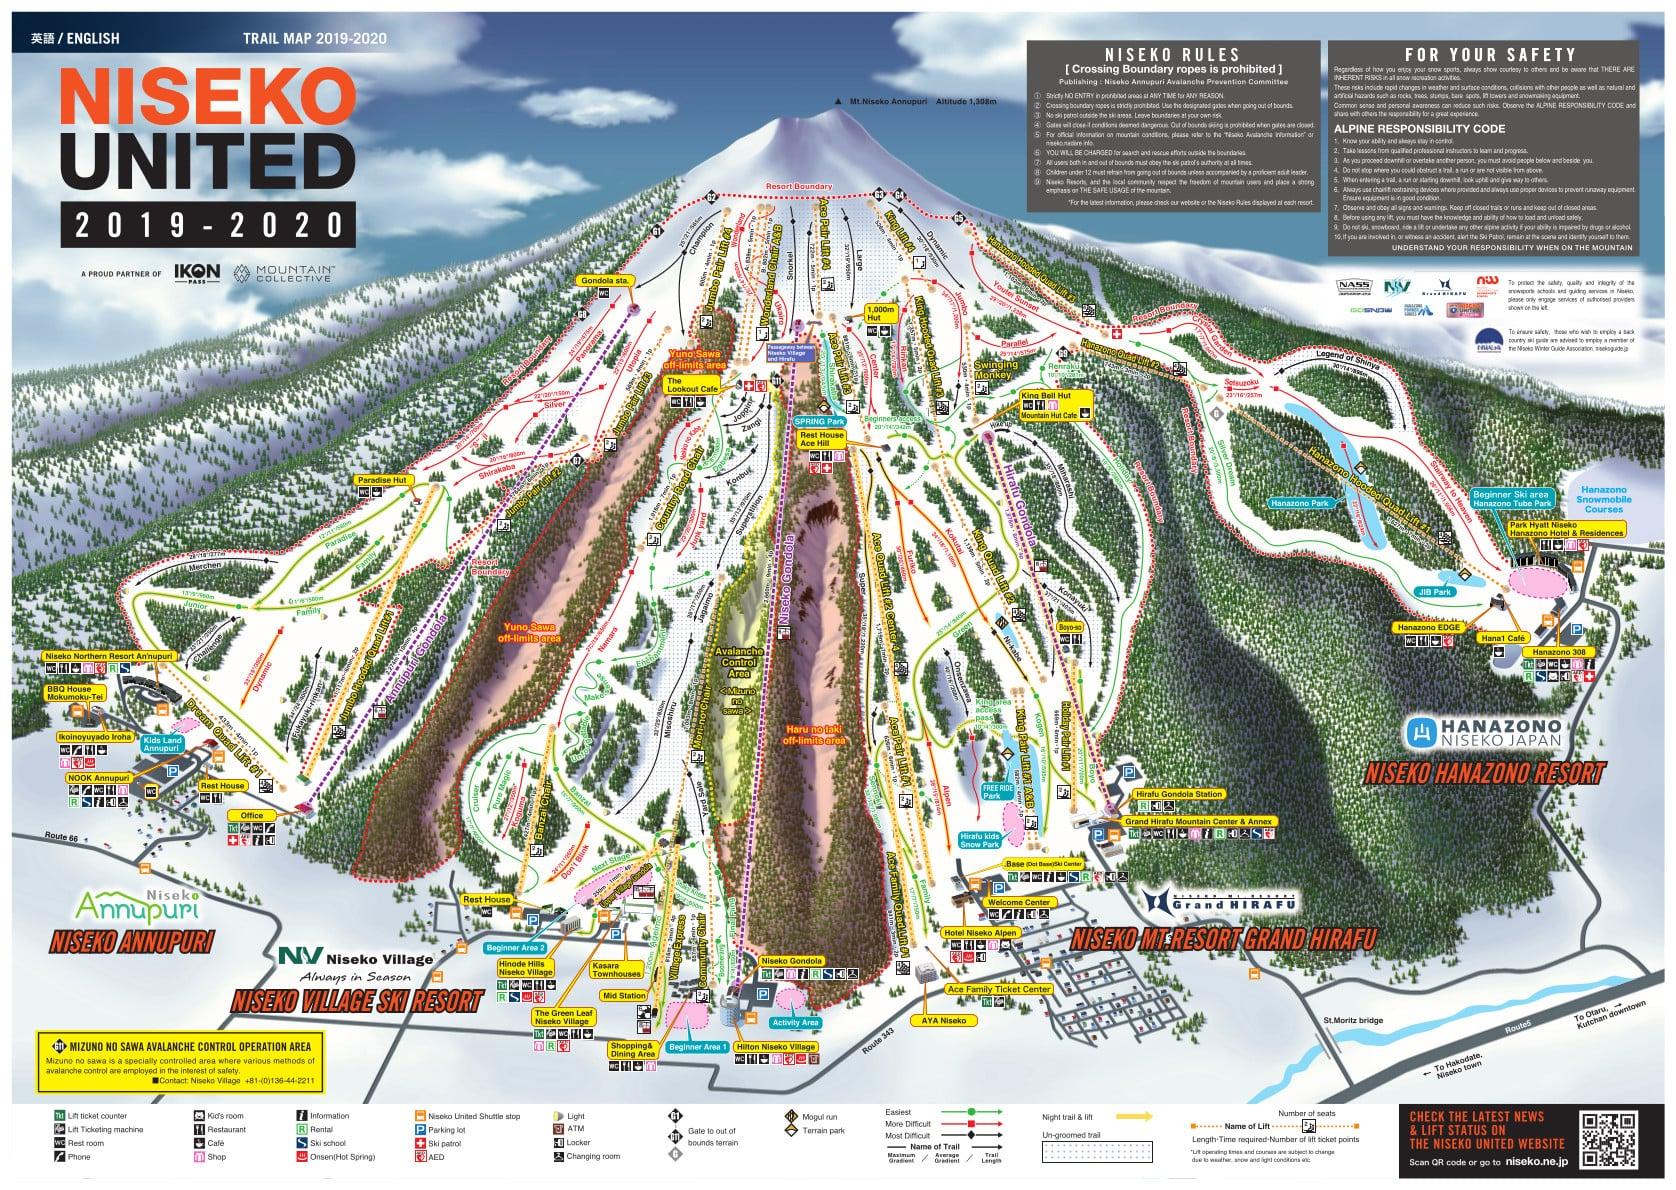 Niseko Annupuri Piste / Trail Map